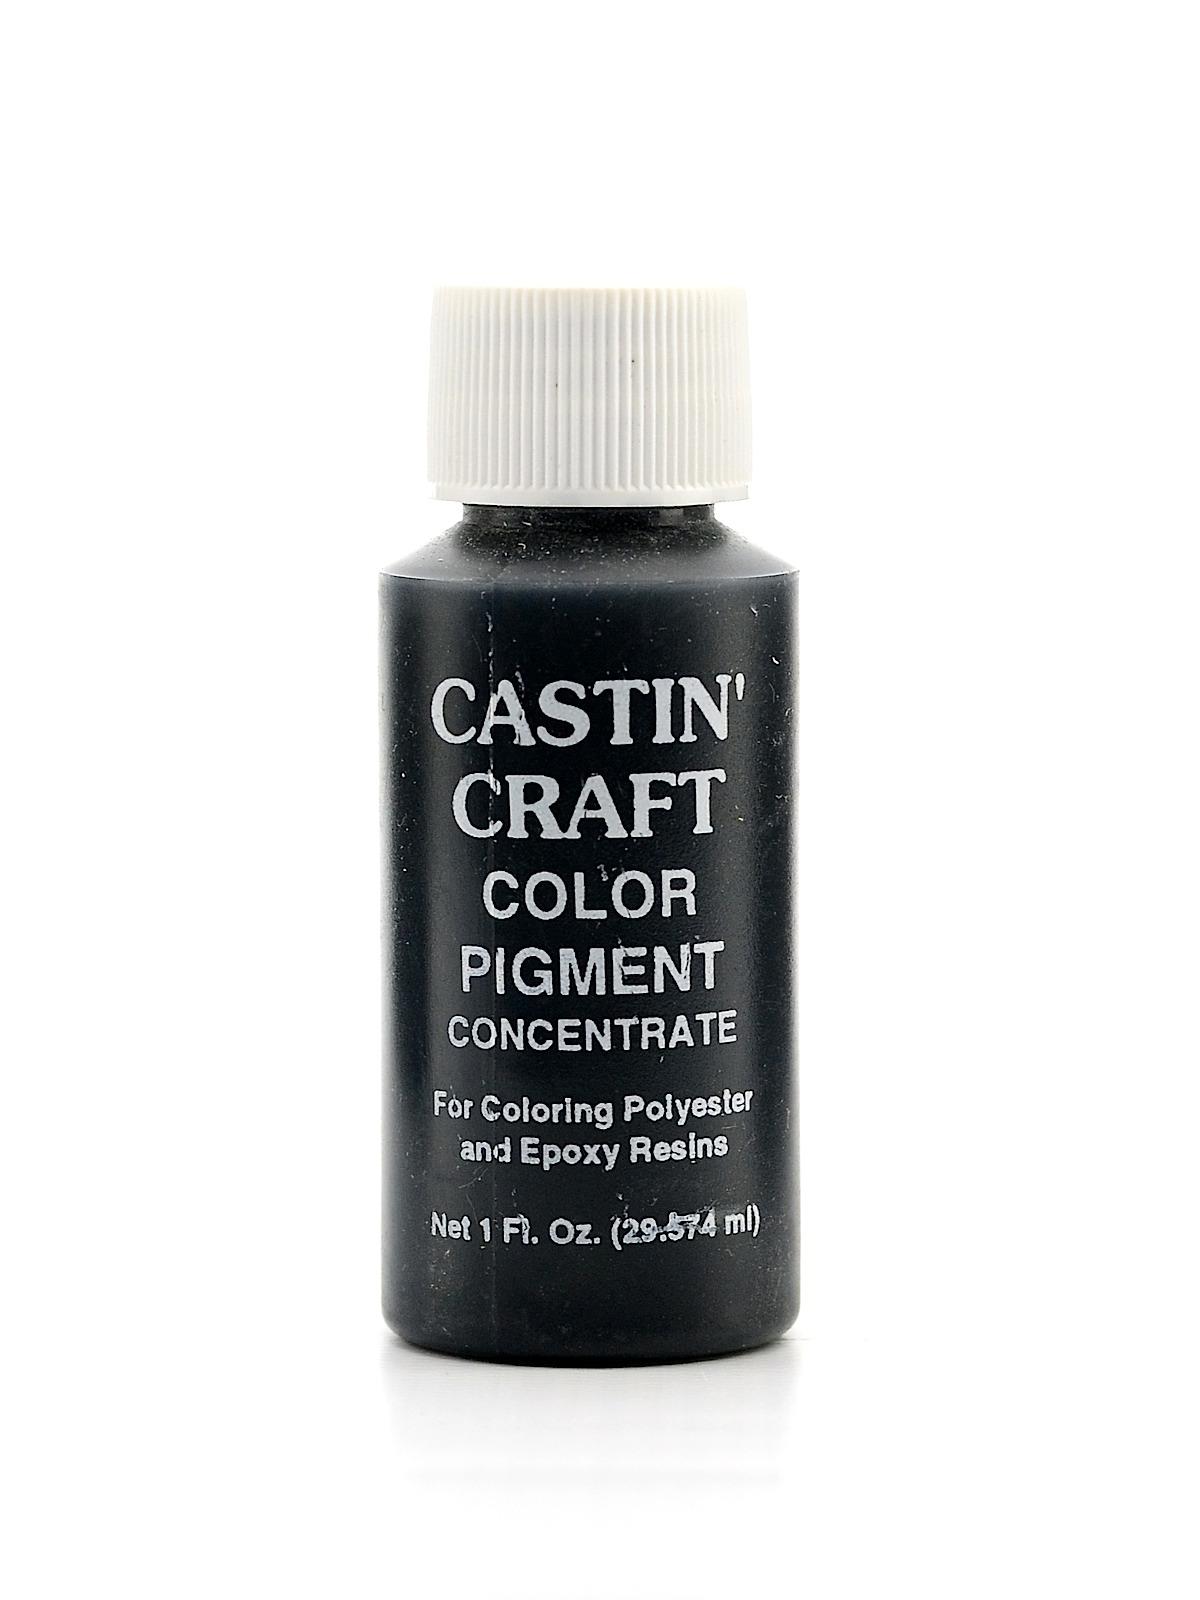 Castin craft color pigment - Black